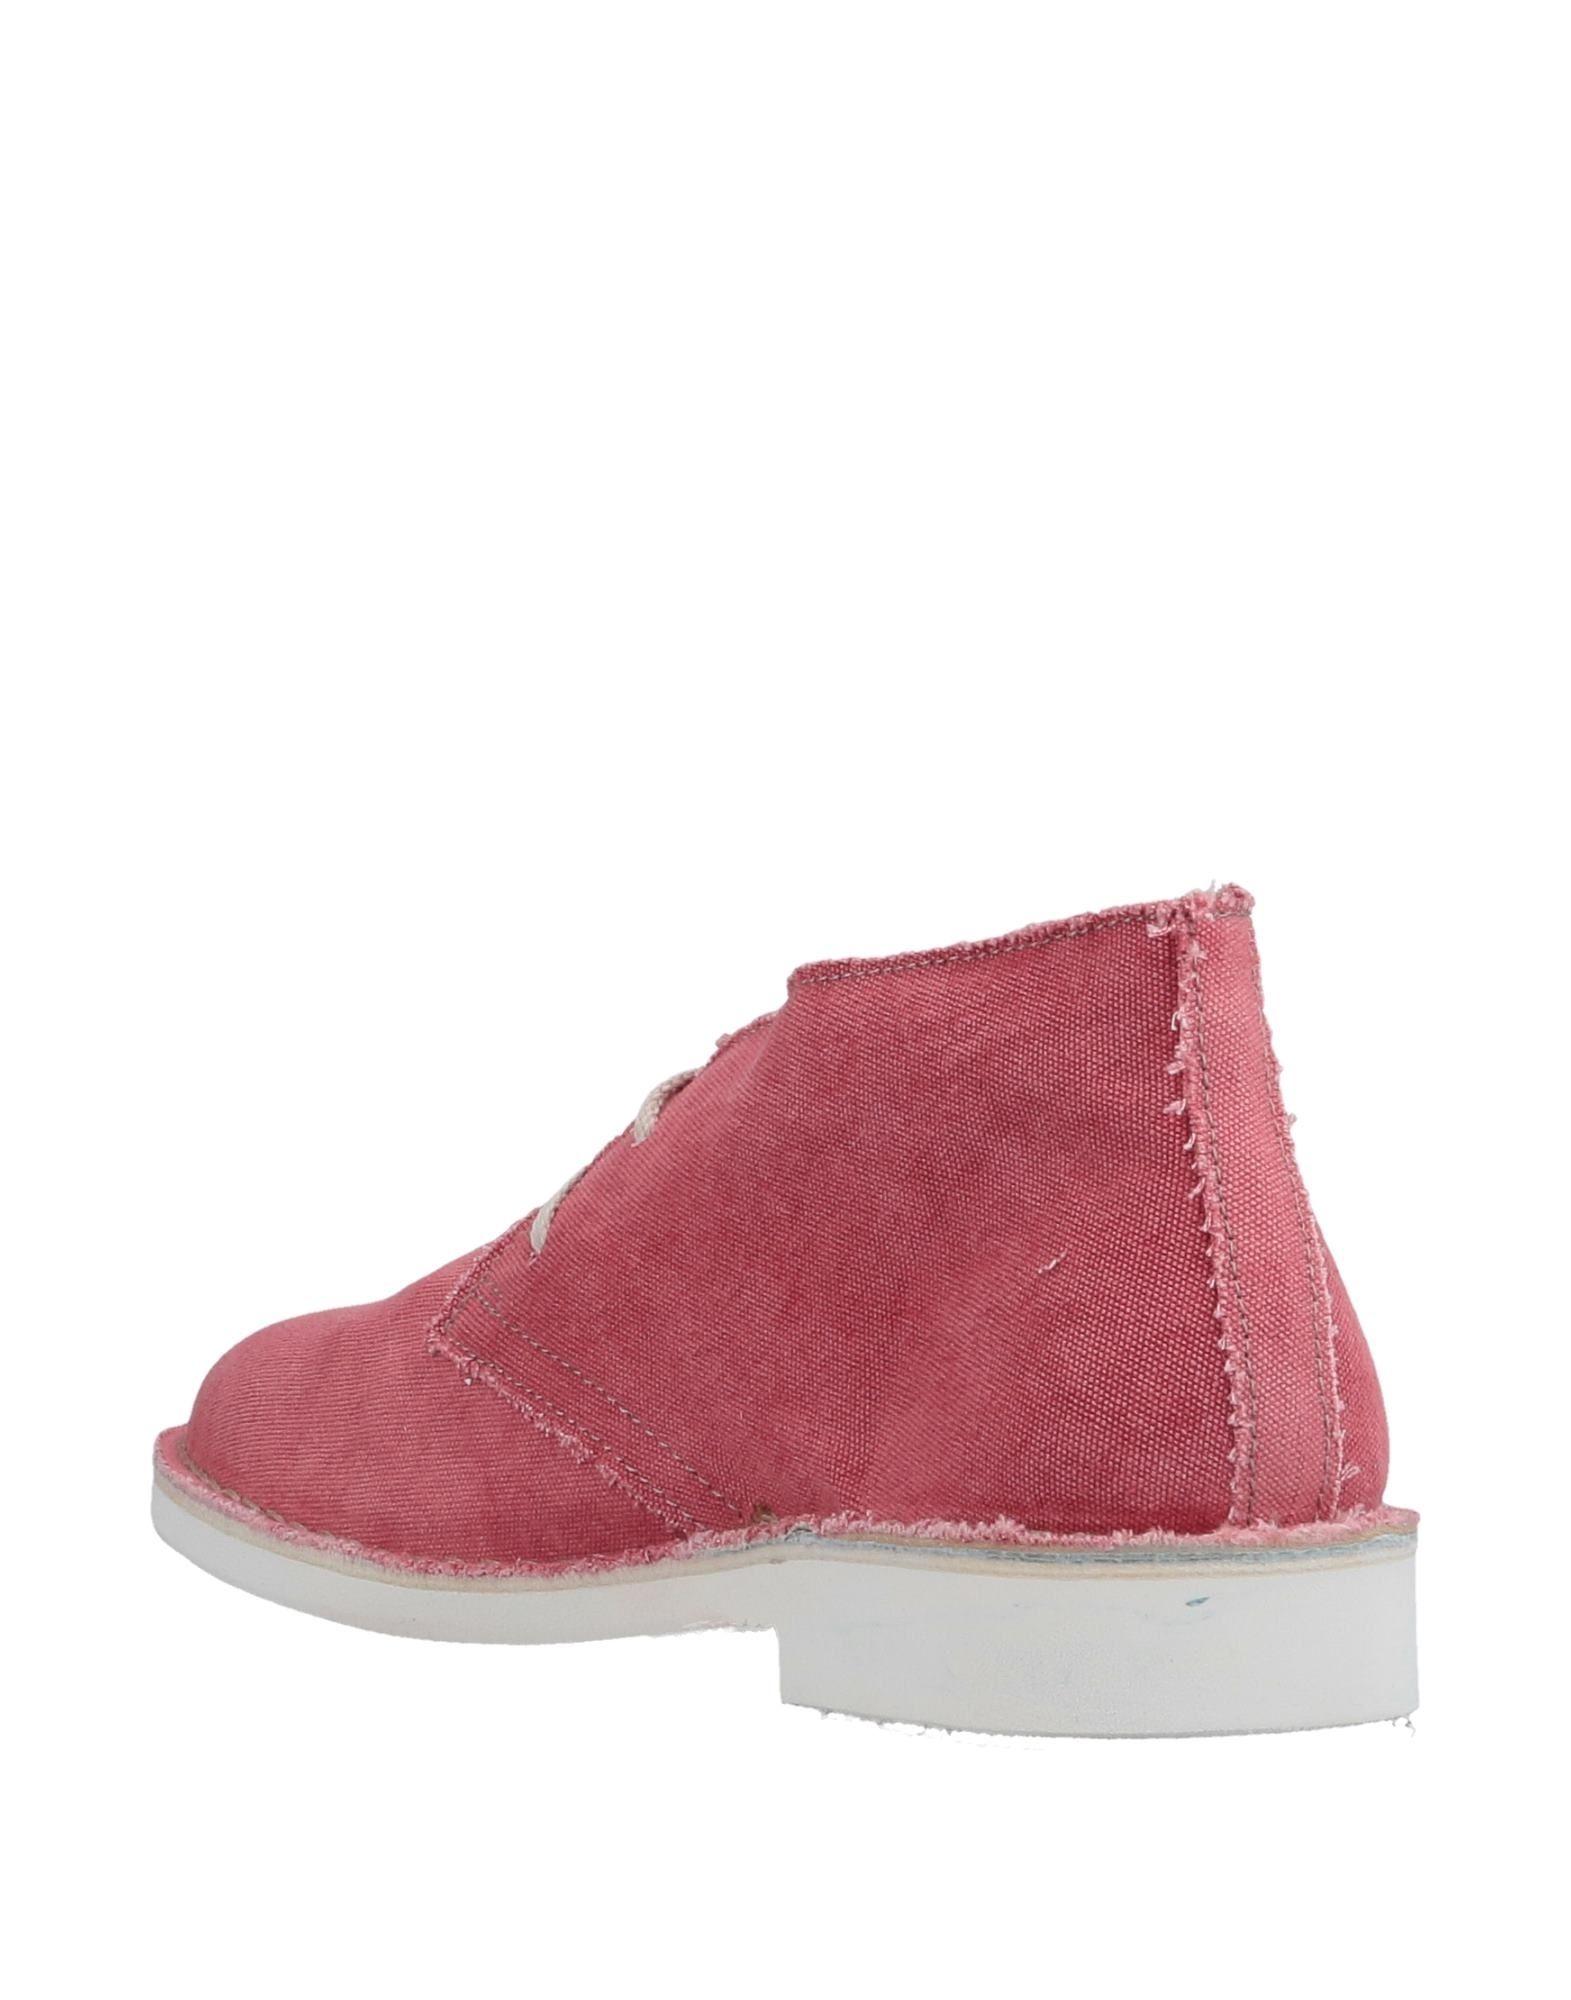 Rabatt echte Stiefelette Schuhe Wally Walker Stiefelette echte Herren  11383244UE 32f1ad